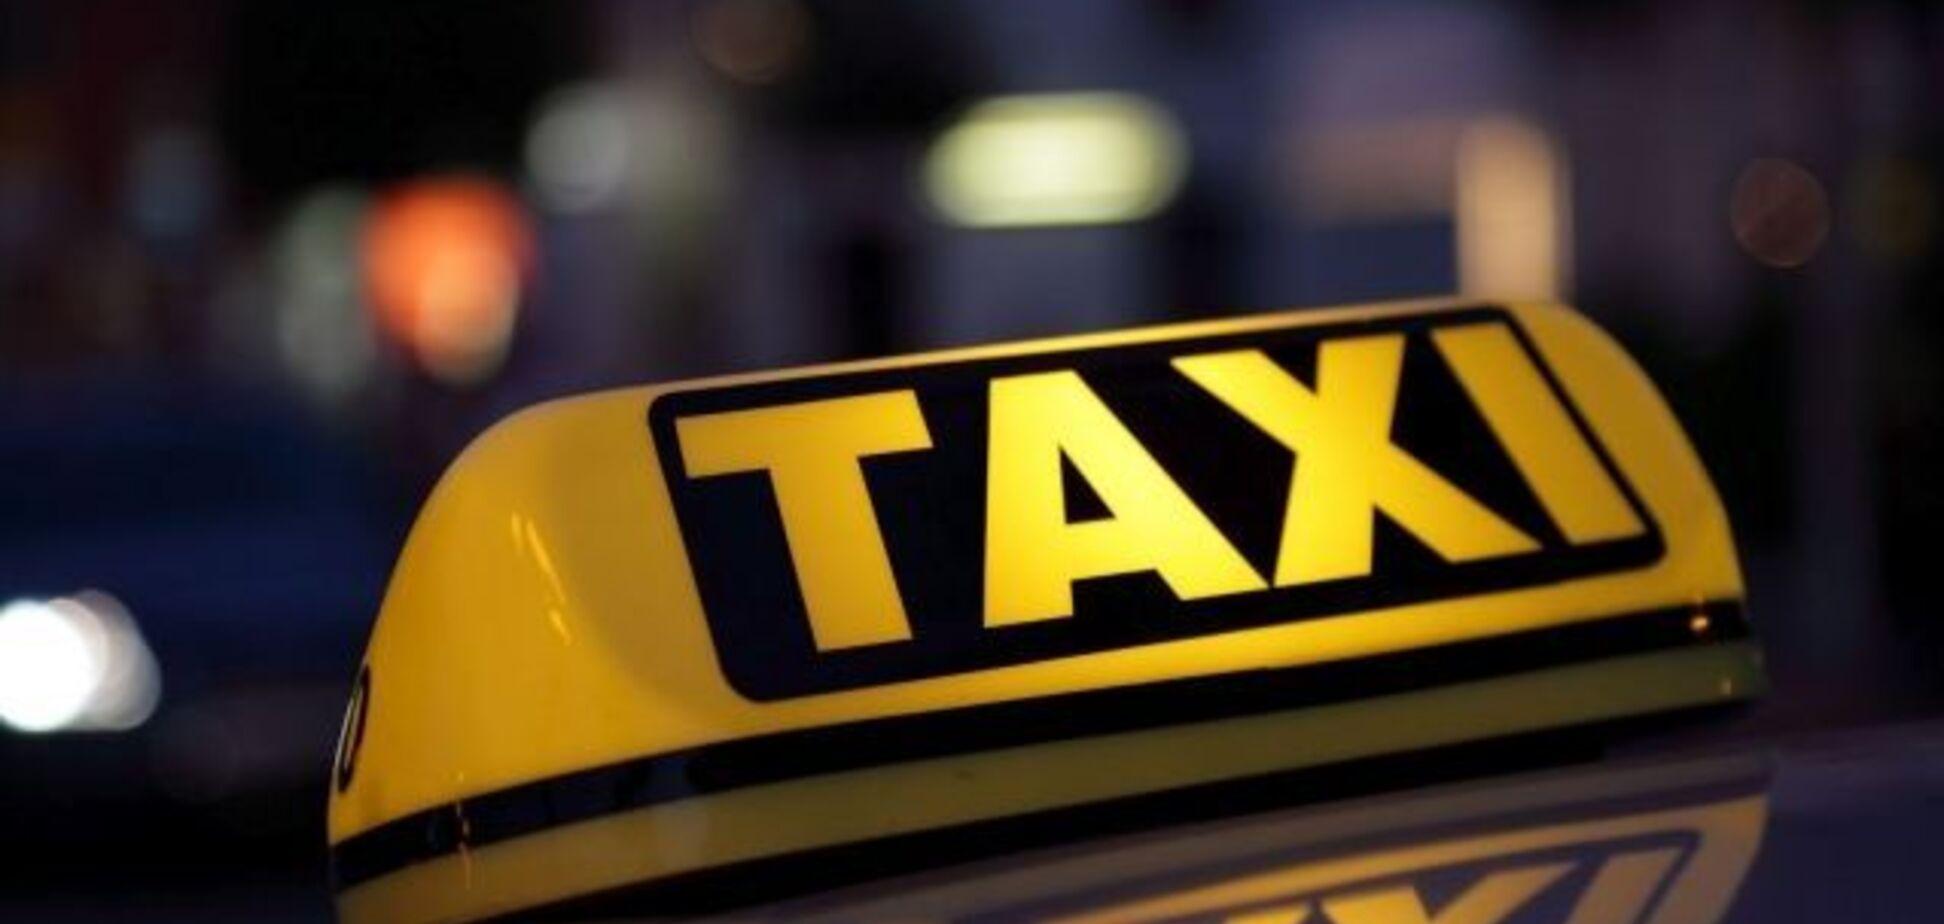 Зарезал и ушел: в Кривом Роге мужчина хладнокровно убил таксиста